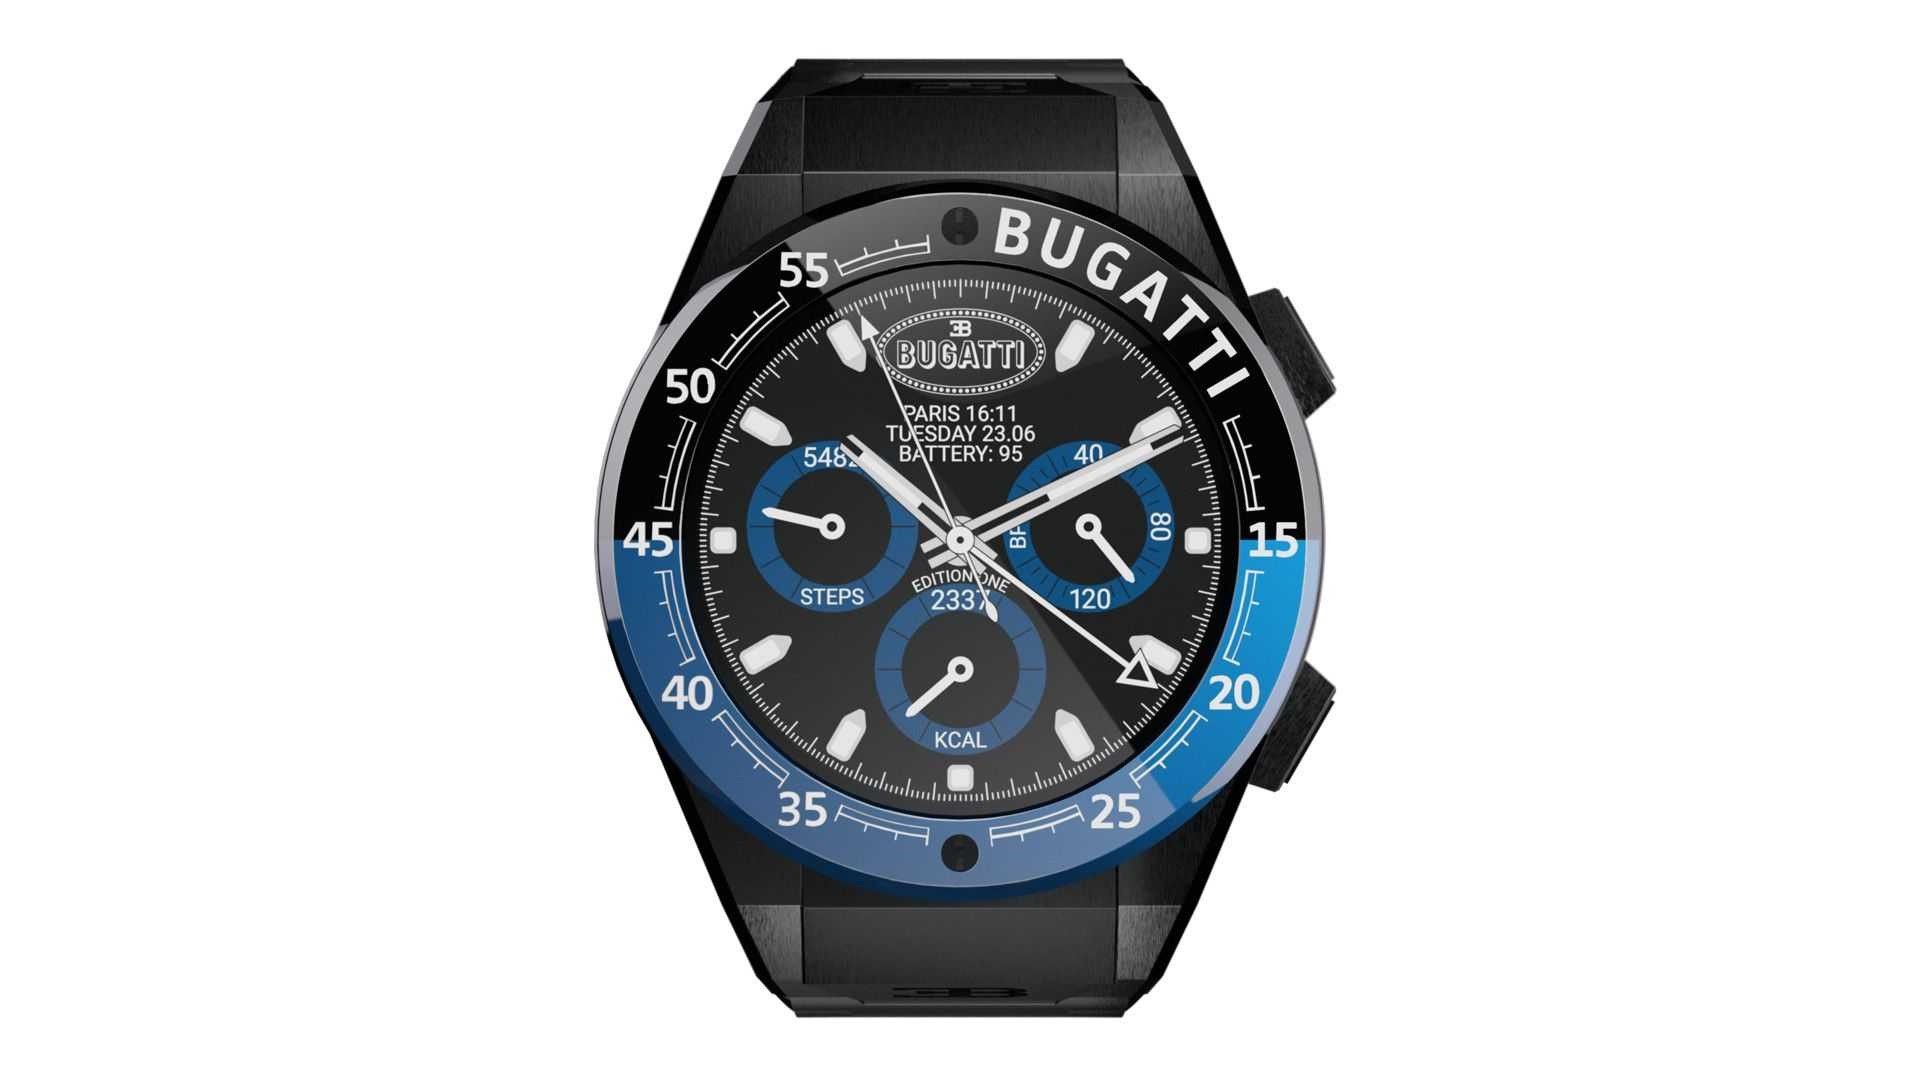 Bugatti_Smartwatch-0000